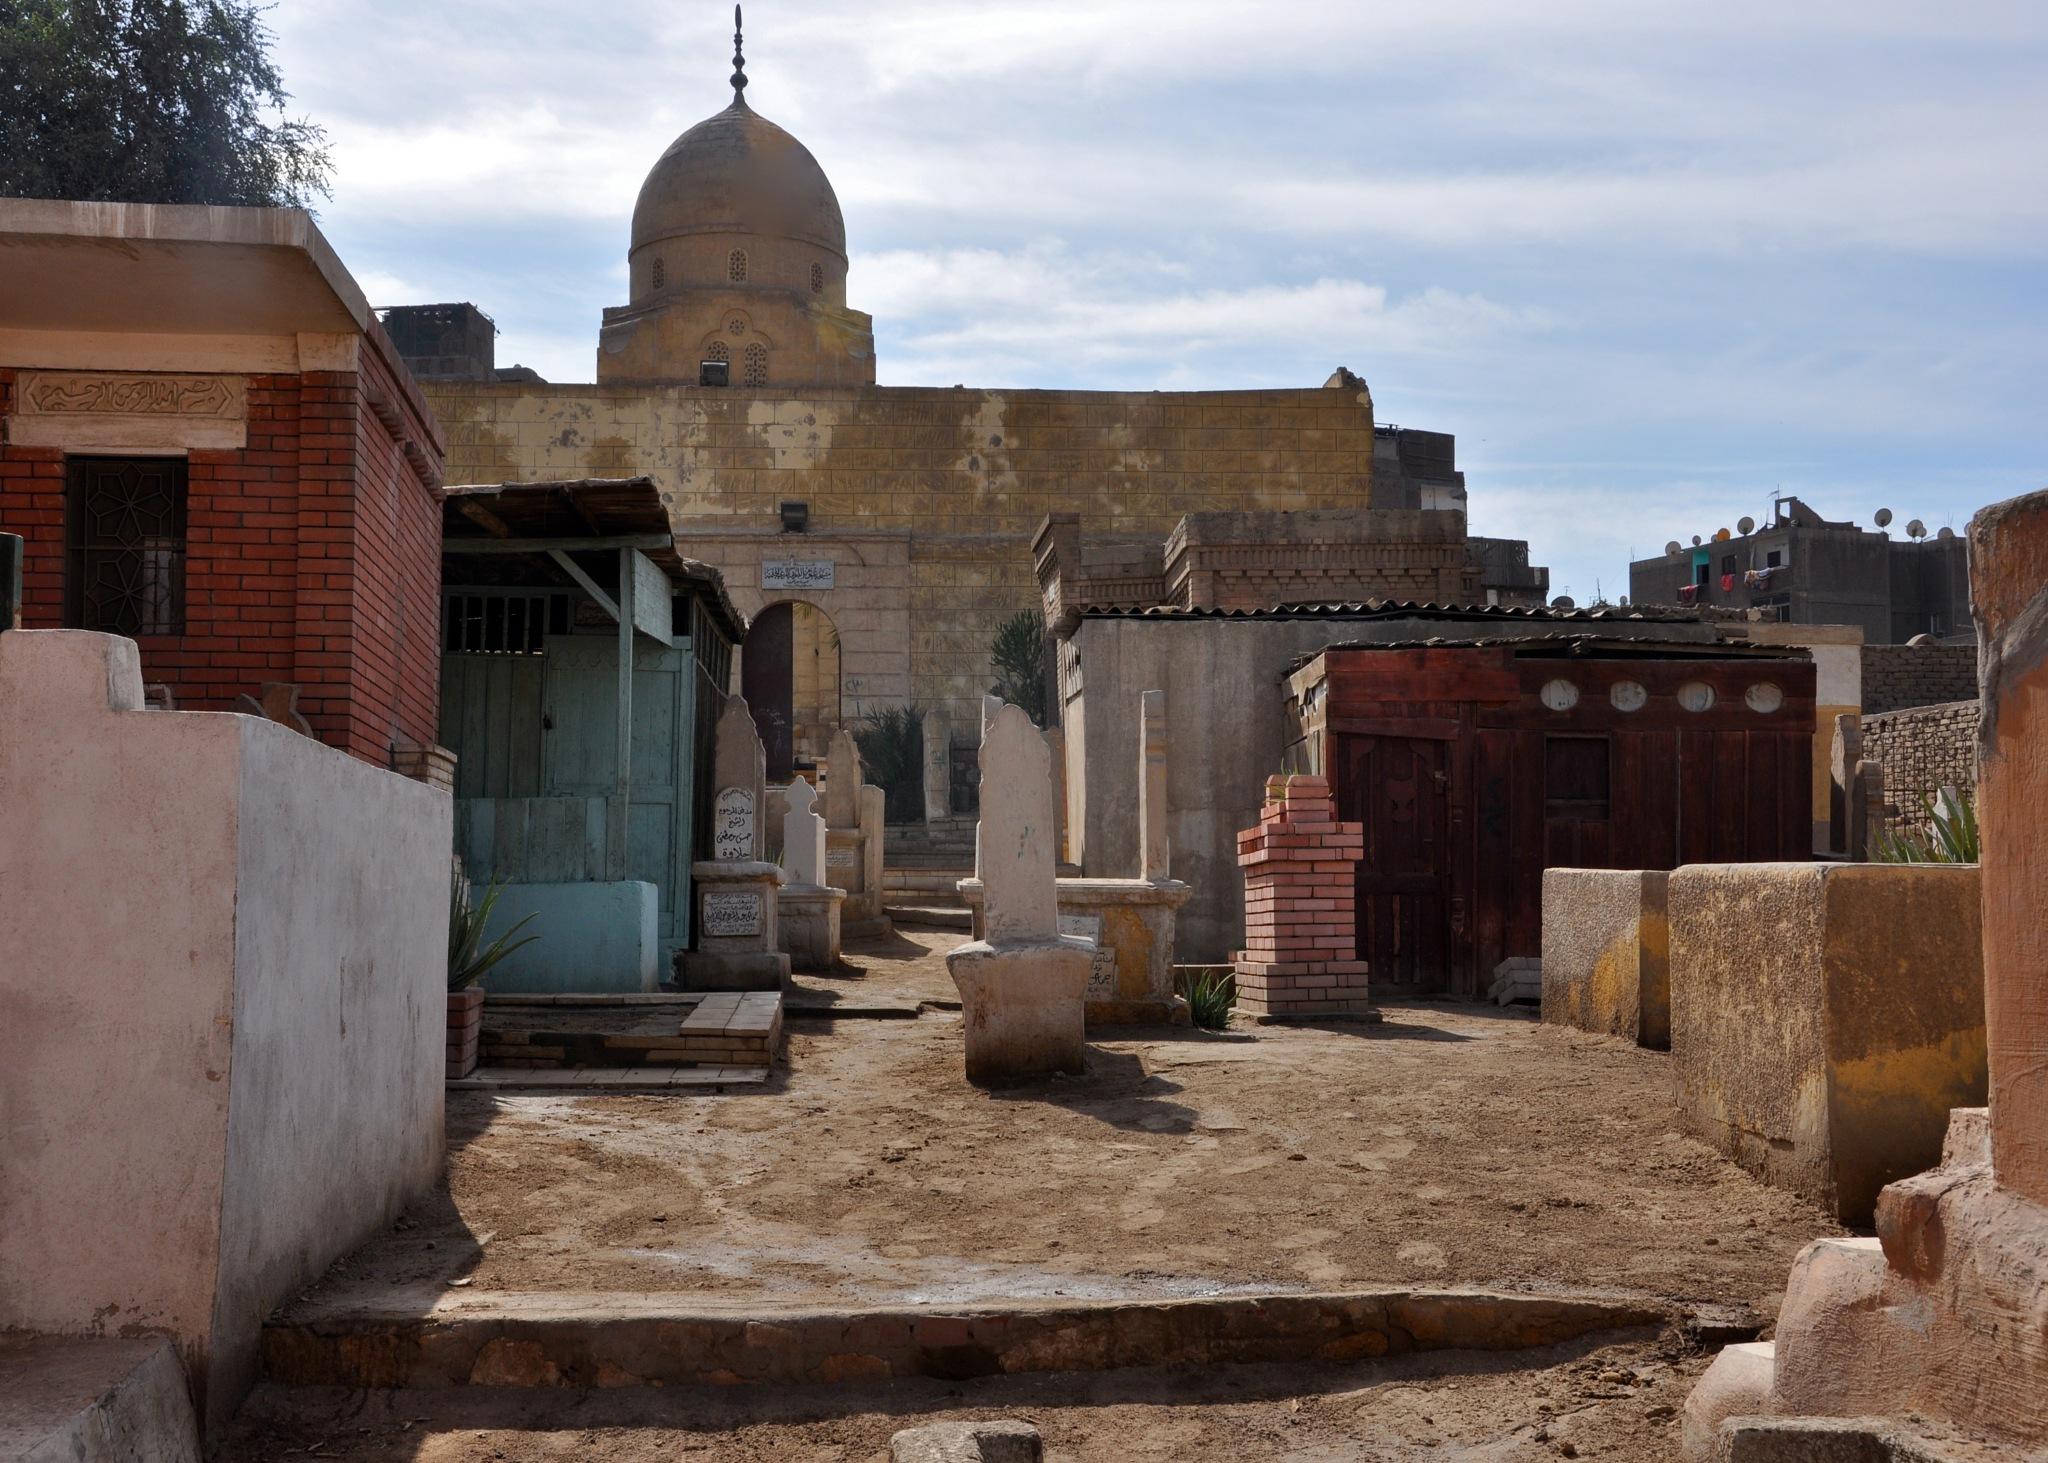 City of the Dead, Cairo by kfboland125